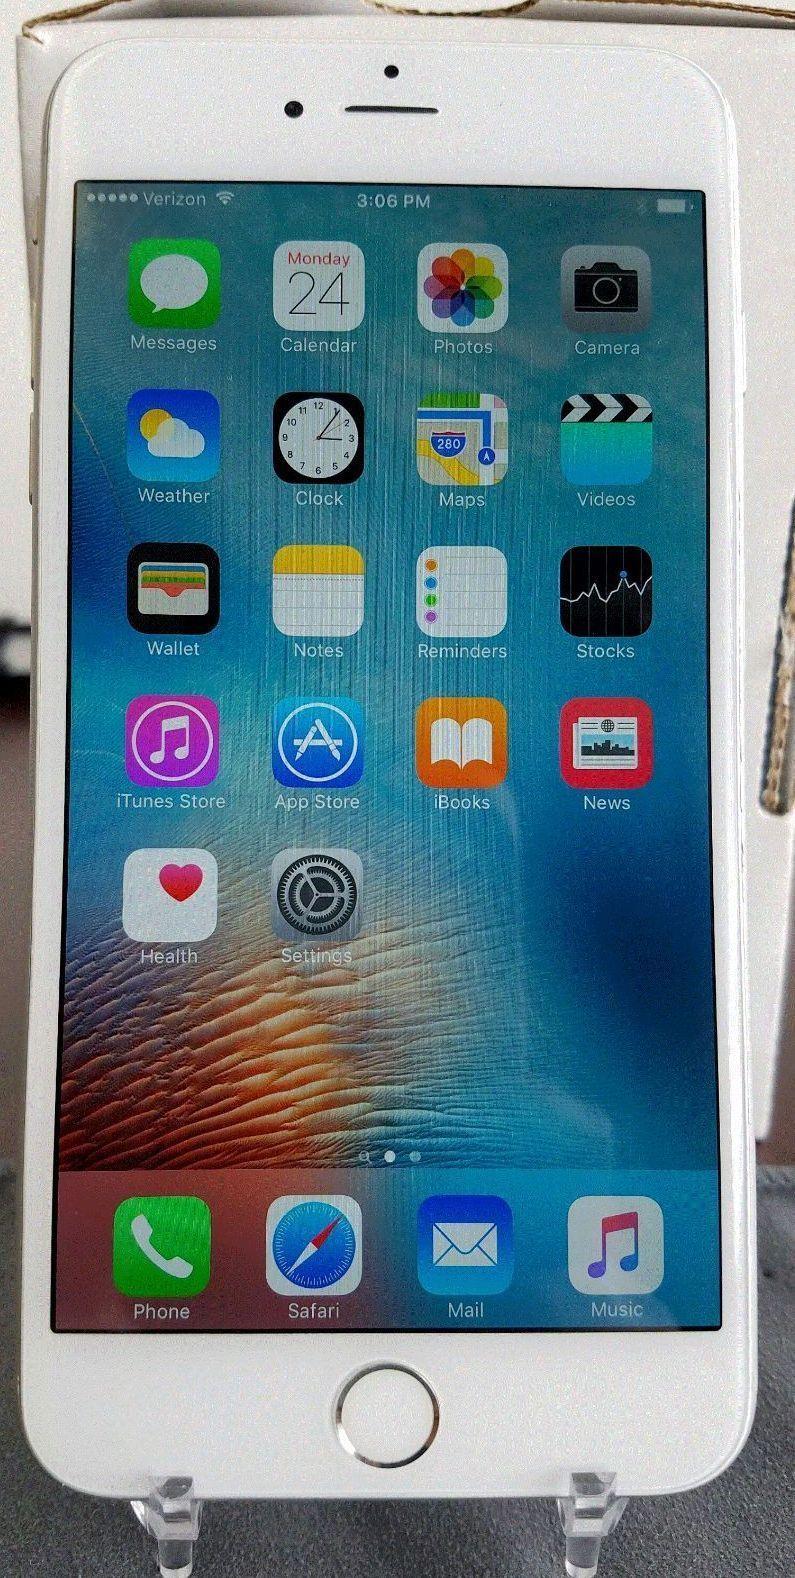 Apple iPhone 6 Plus 16GB Space Gray (Verizon) GSM